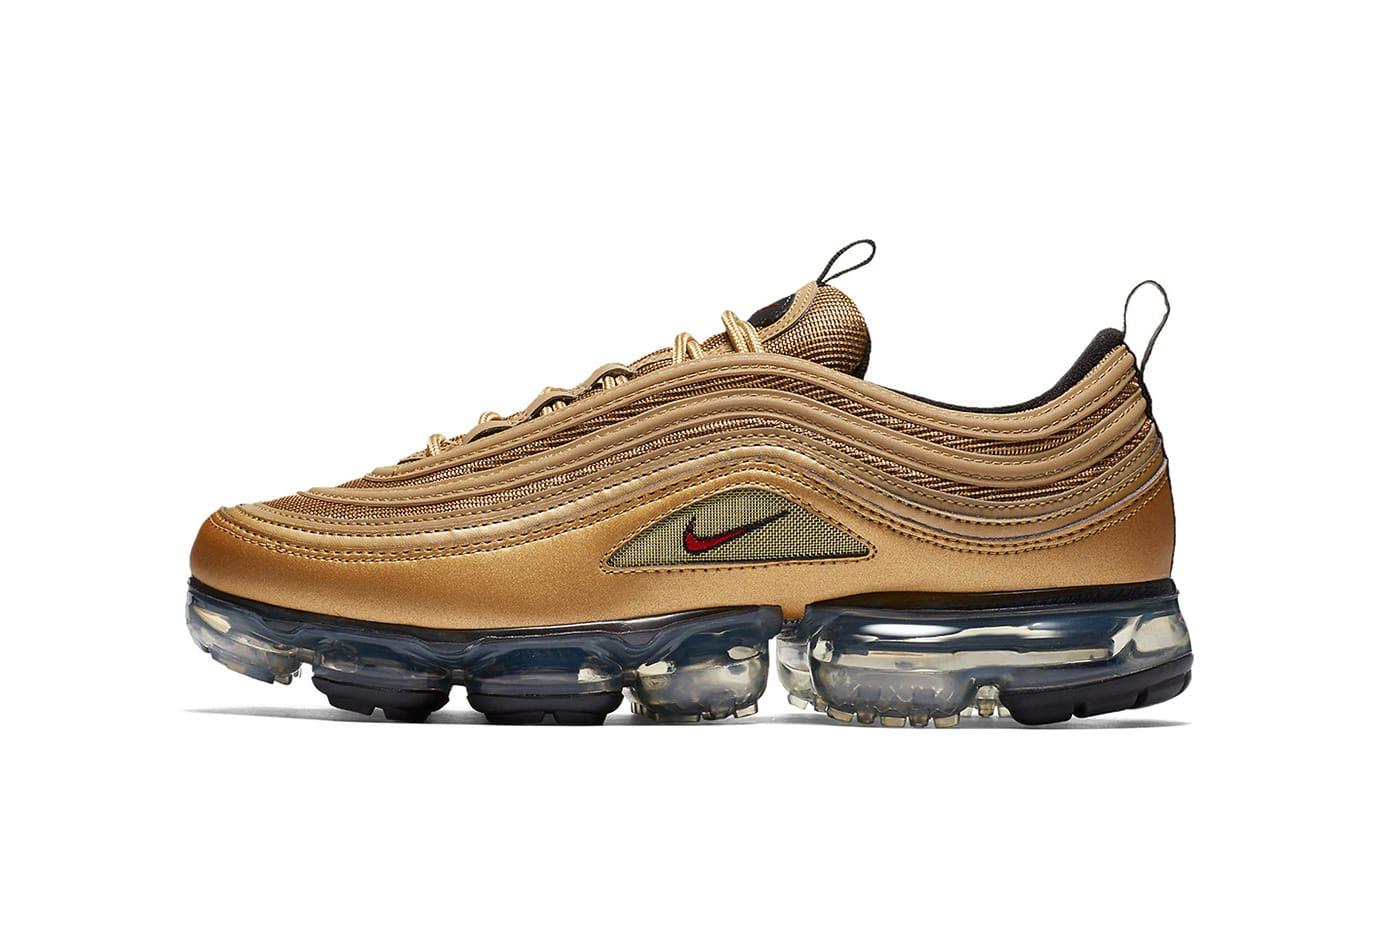 Nike Air VaporMax 97 in Metallic Gold